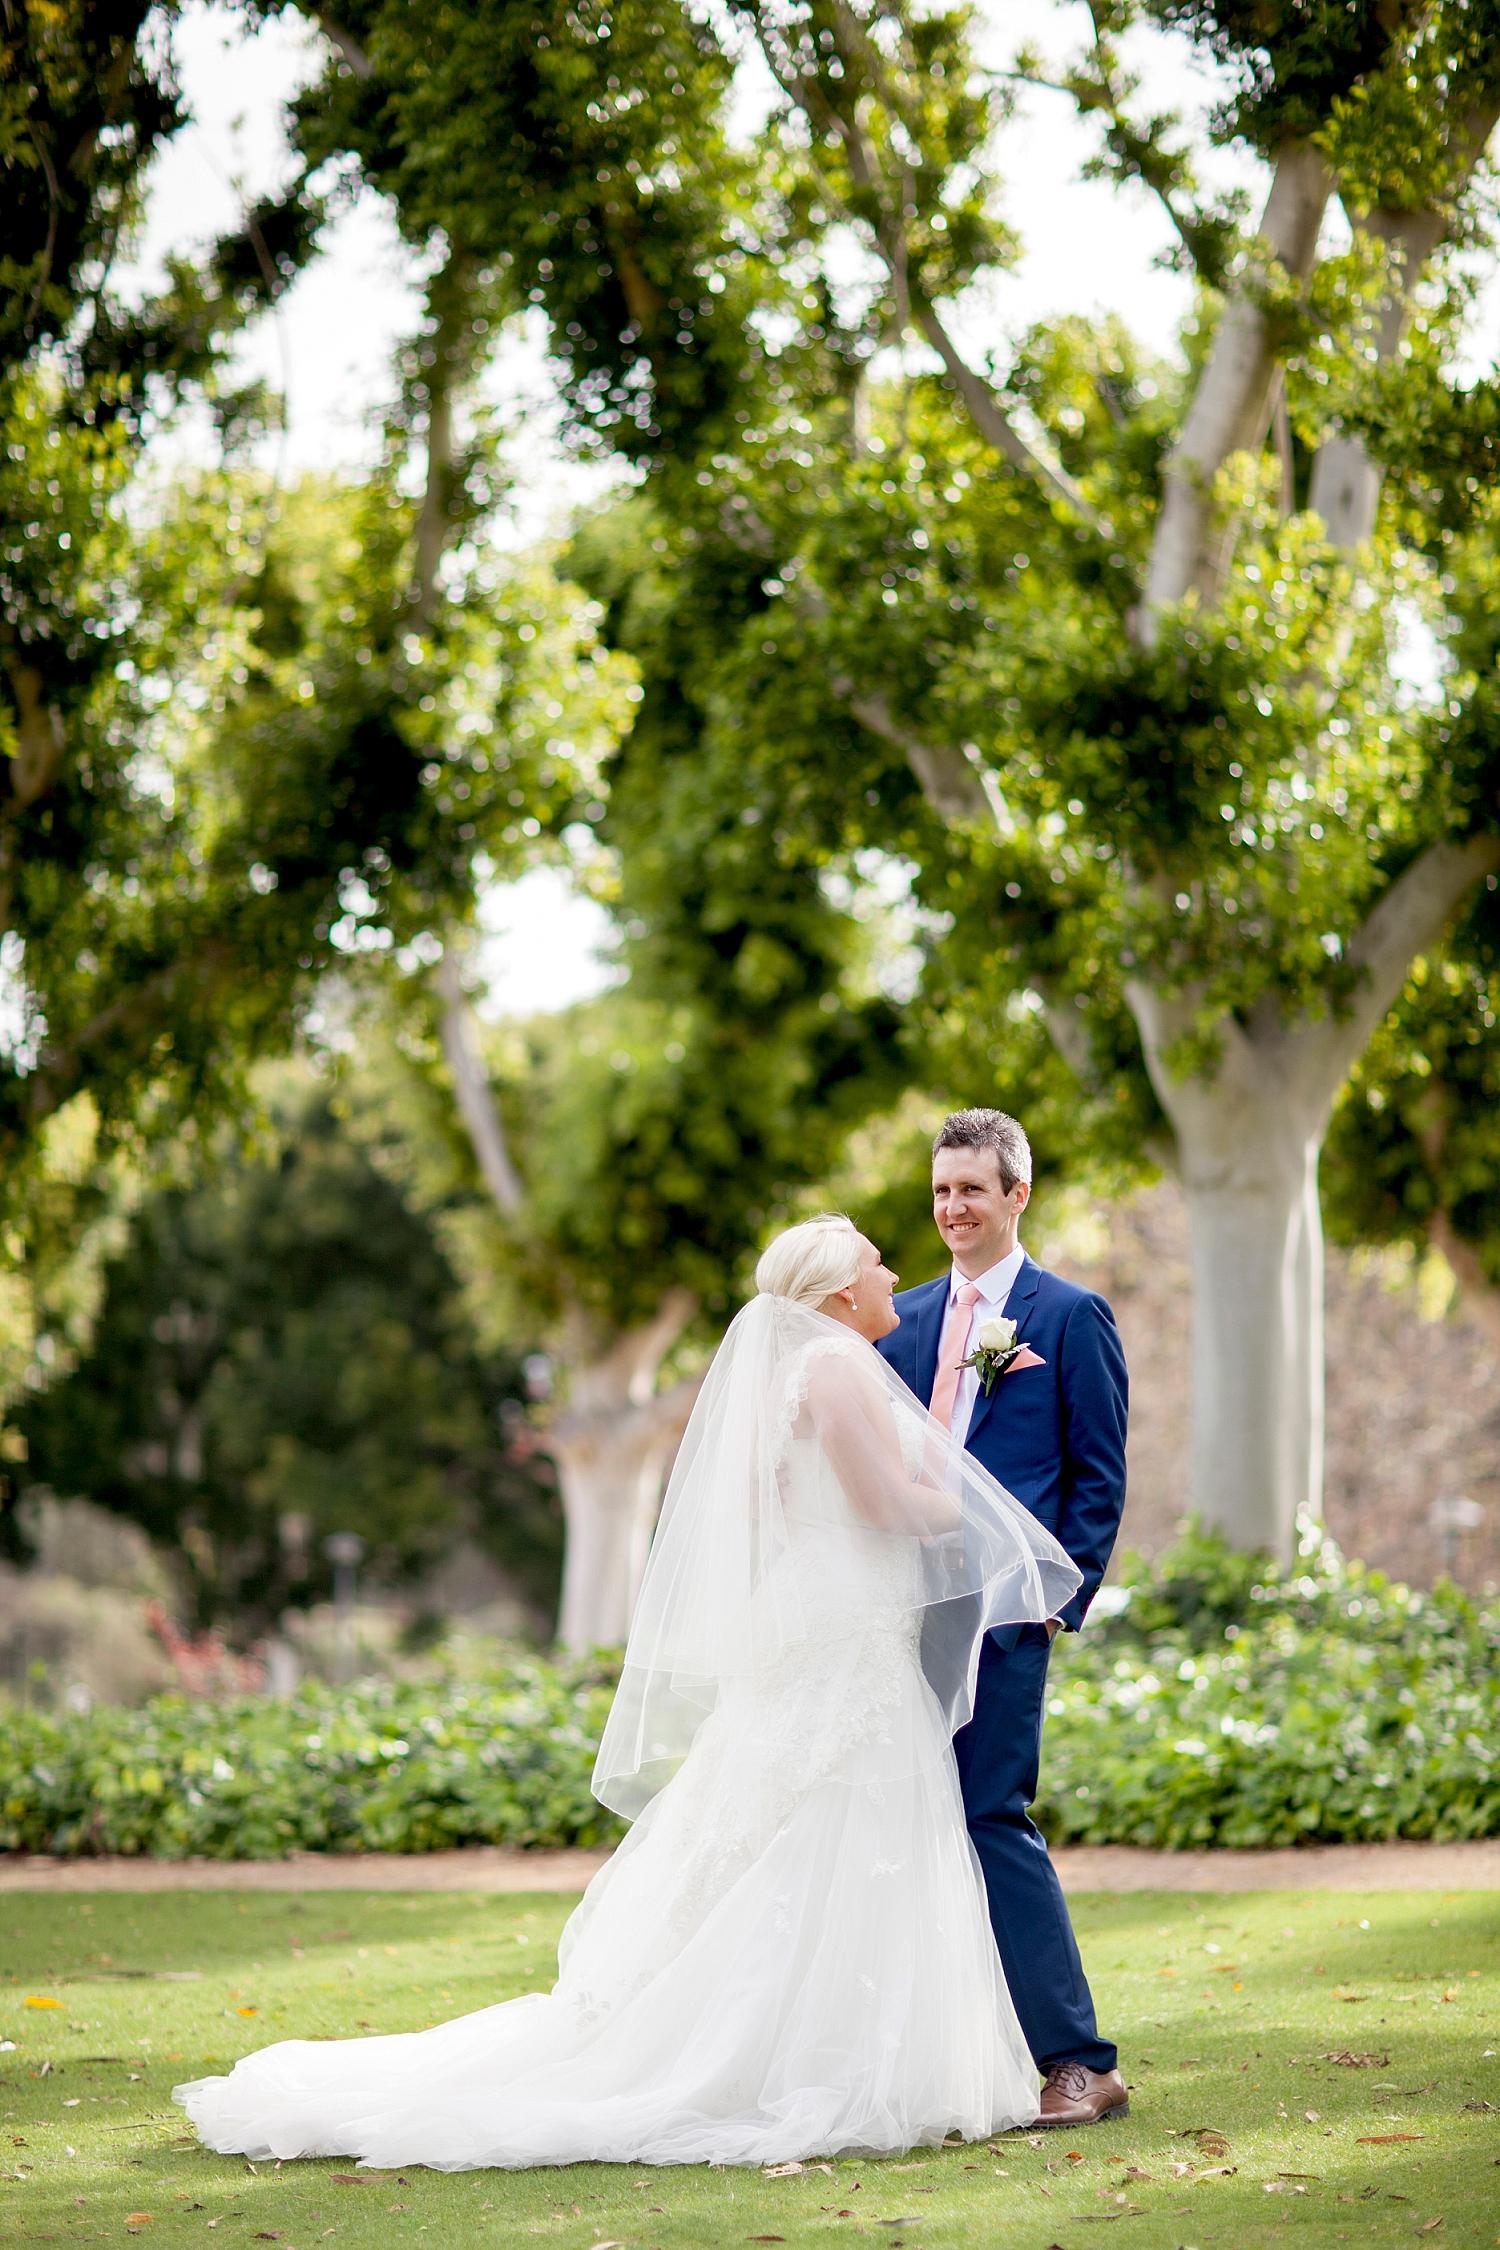 67_perth wedding photographer deray simcoe .jpg